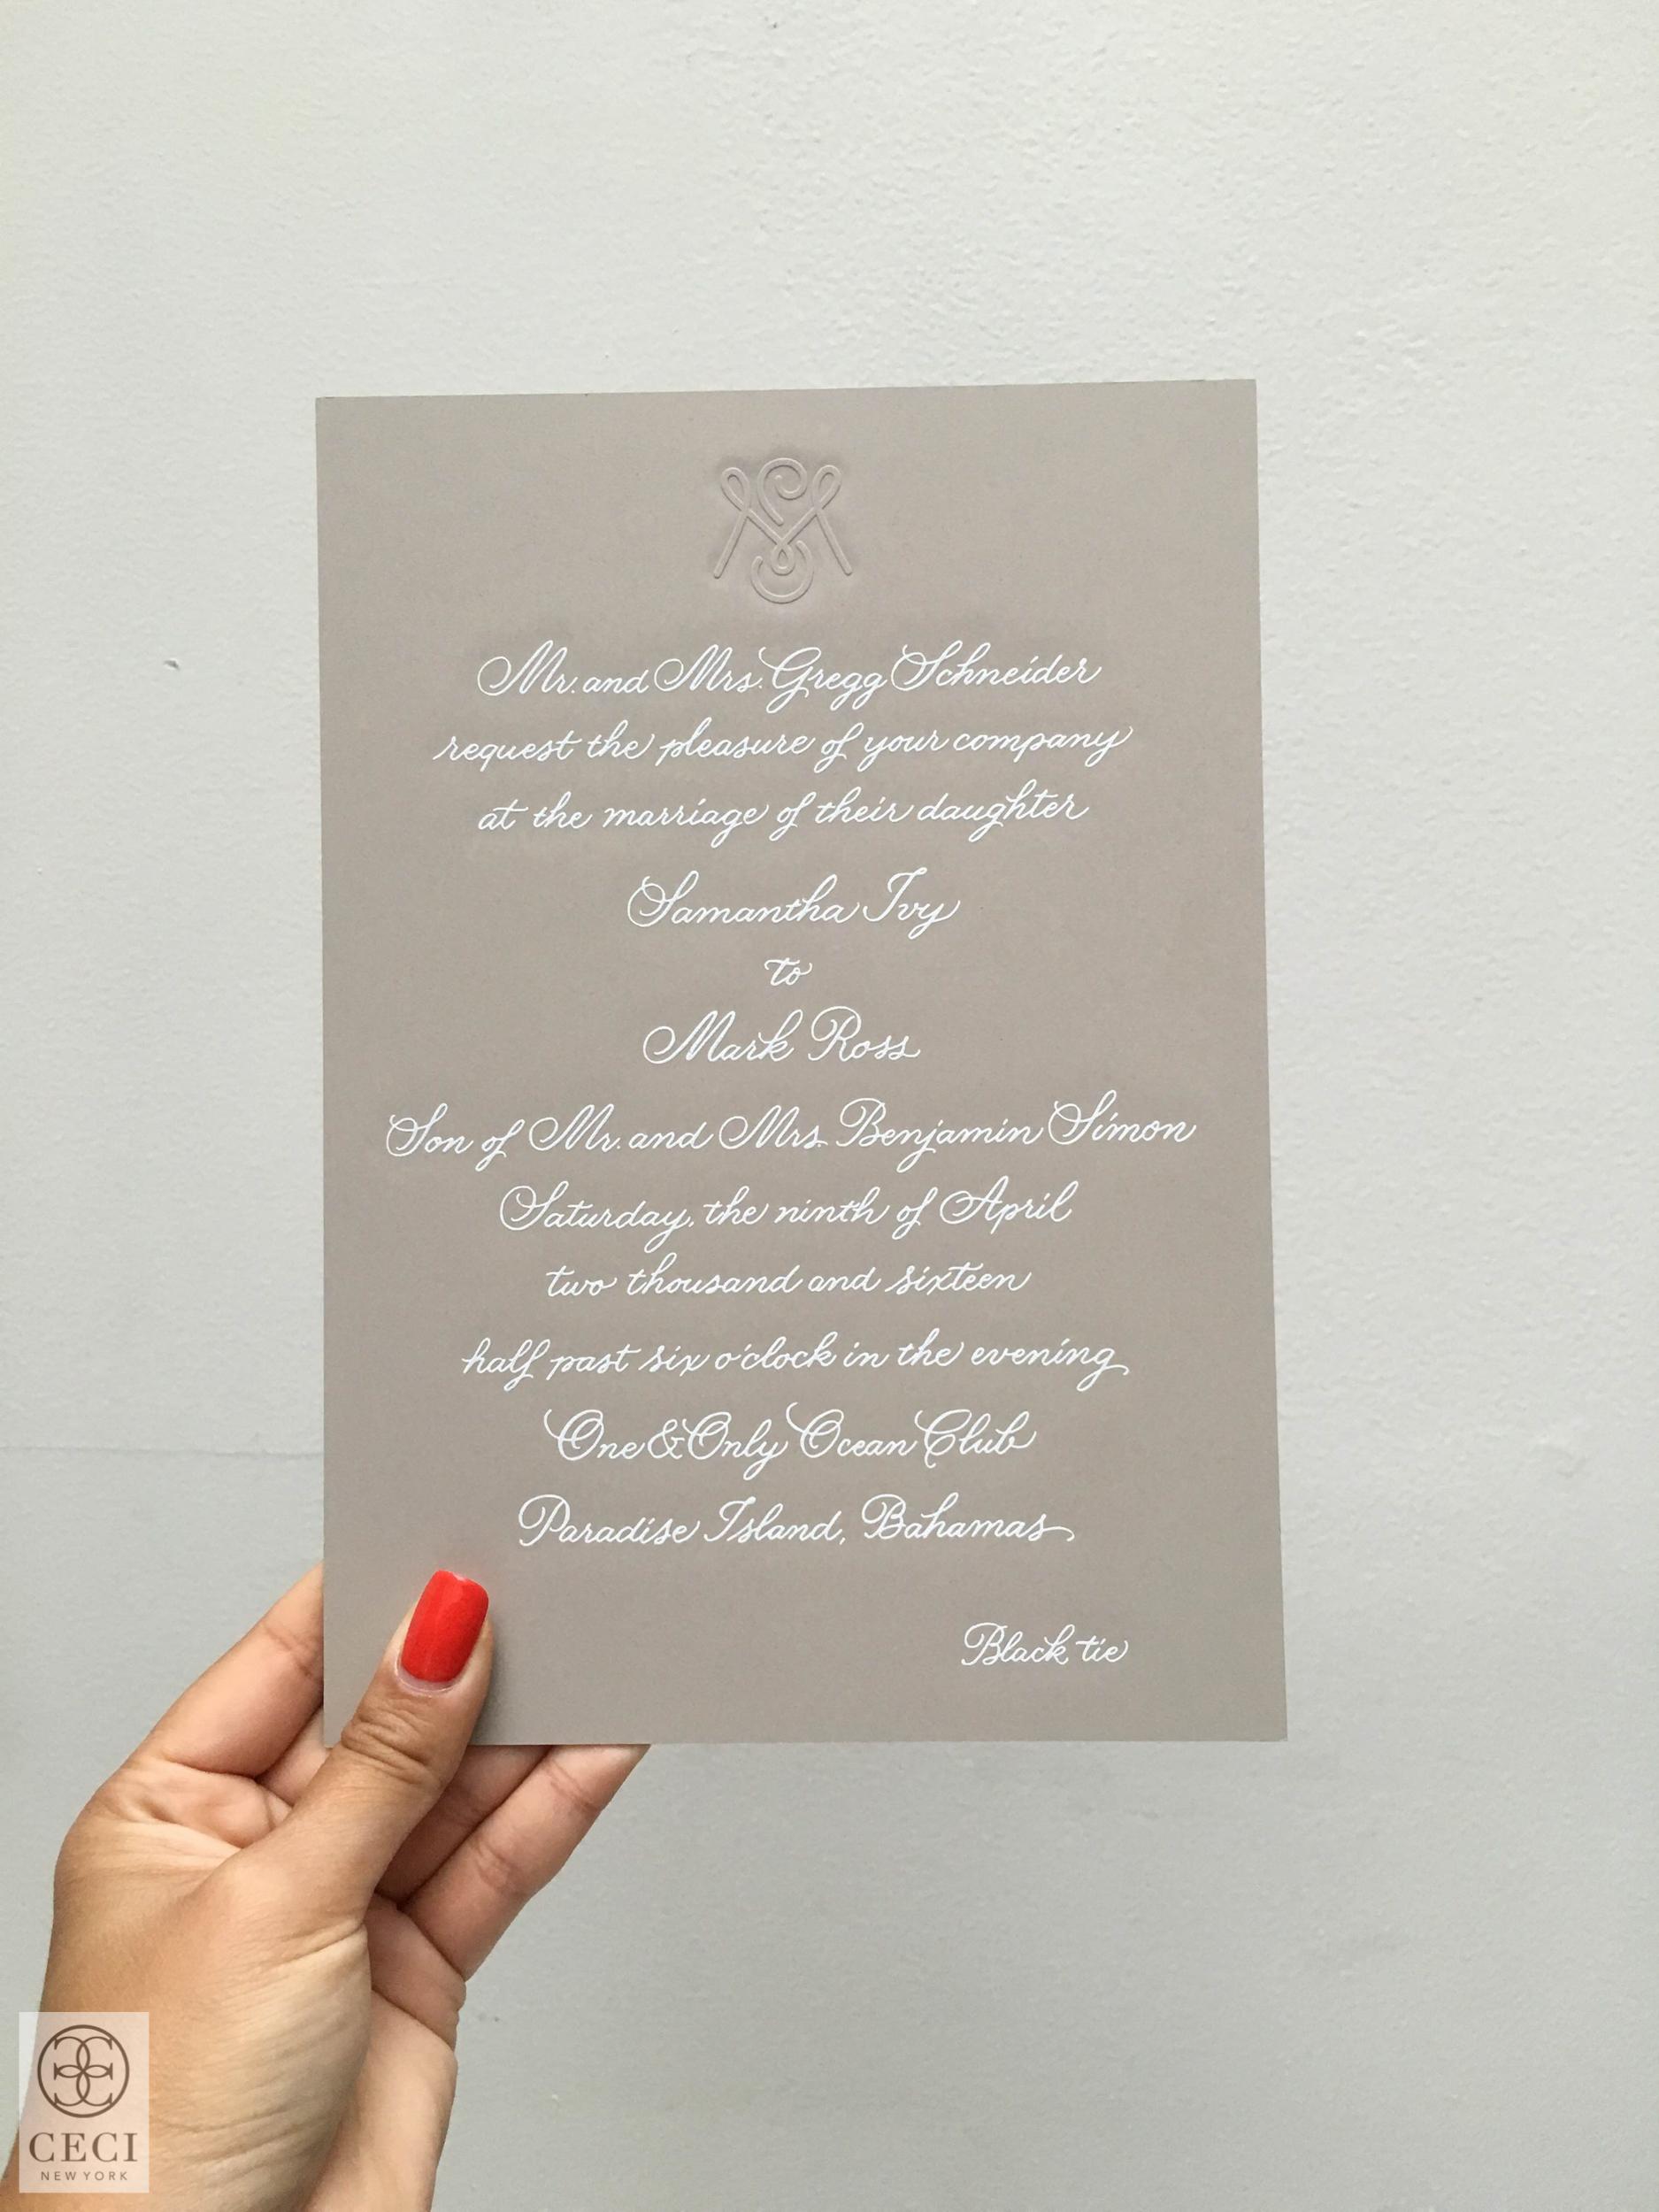 Ceci_New_York_Ceci_Style_Ceci_Johnson_Luxury_Lifestyle_Paradise_Island_Bahamas_Wedding_Engraved_Inspiration_Design_Custom_Couture_Personalized_Invitations_--10.jpg